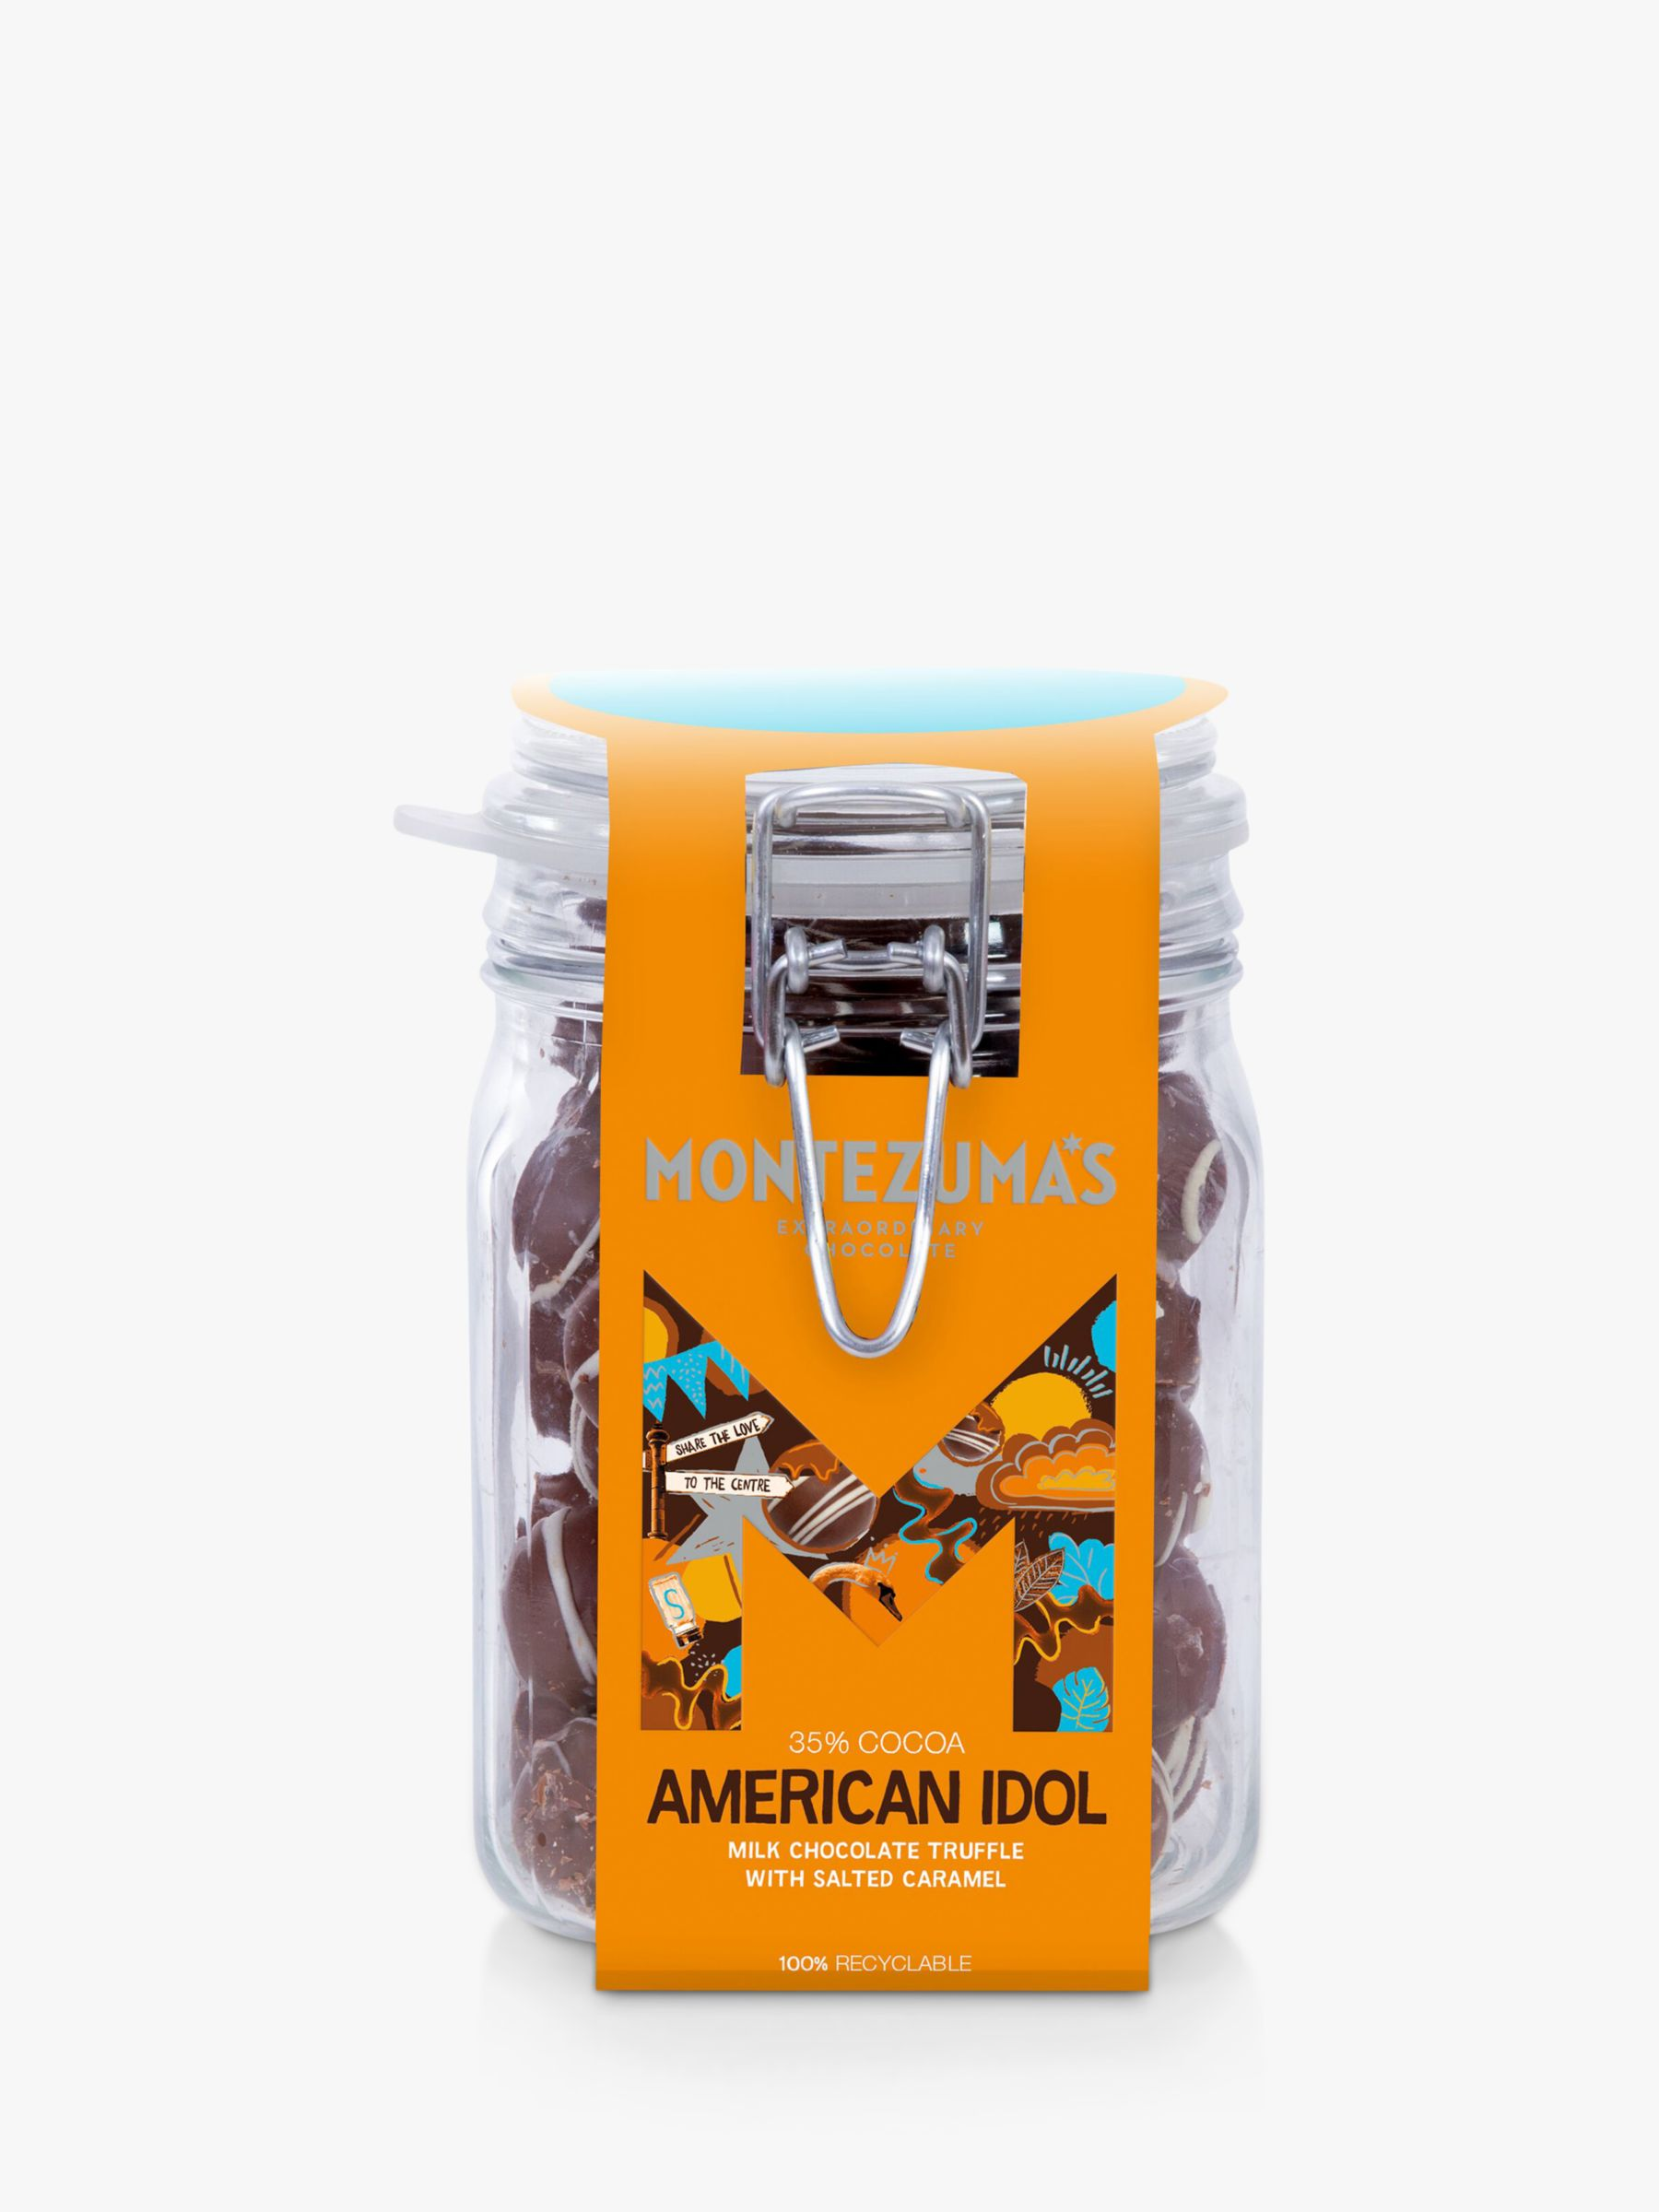 Montezuma's Montezuma's American Idol Milk Chocolate with Salted Caramel Truffle Jar, 600g